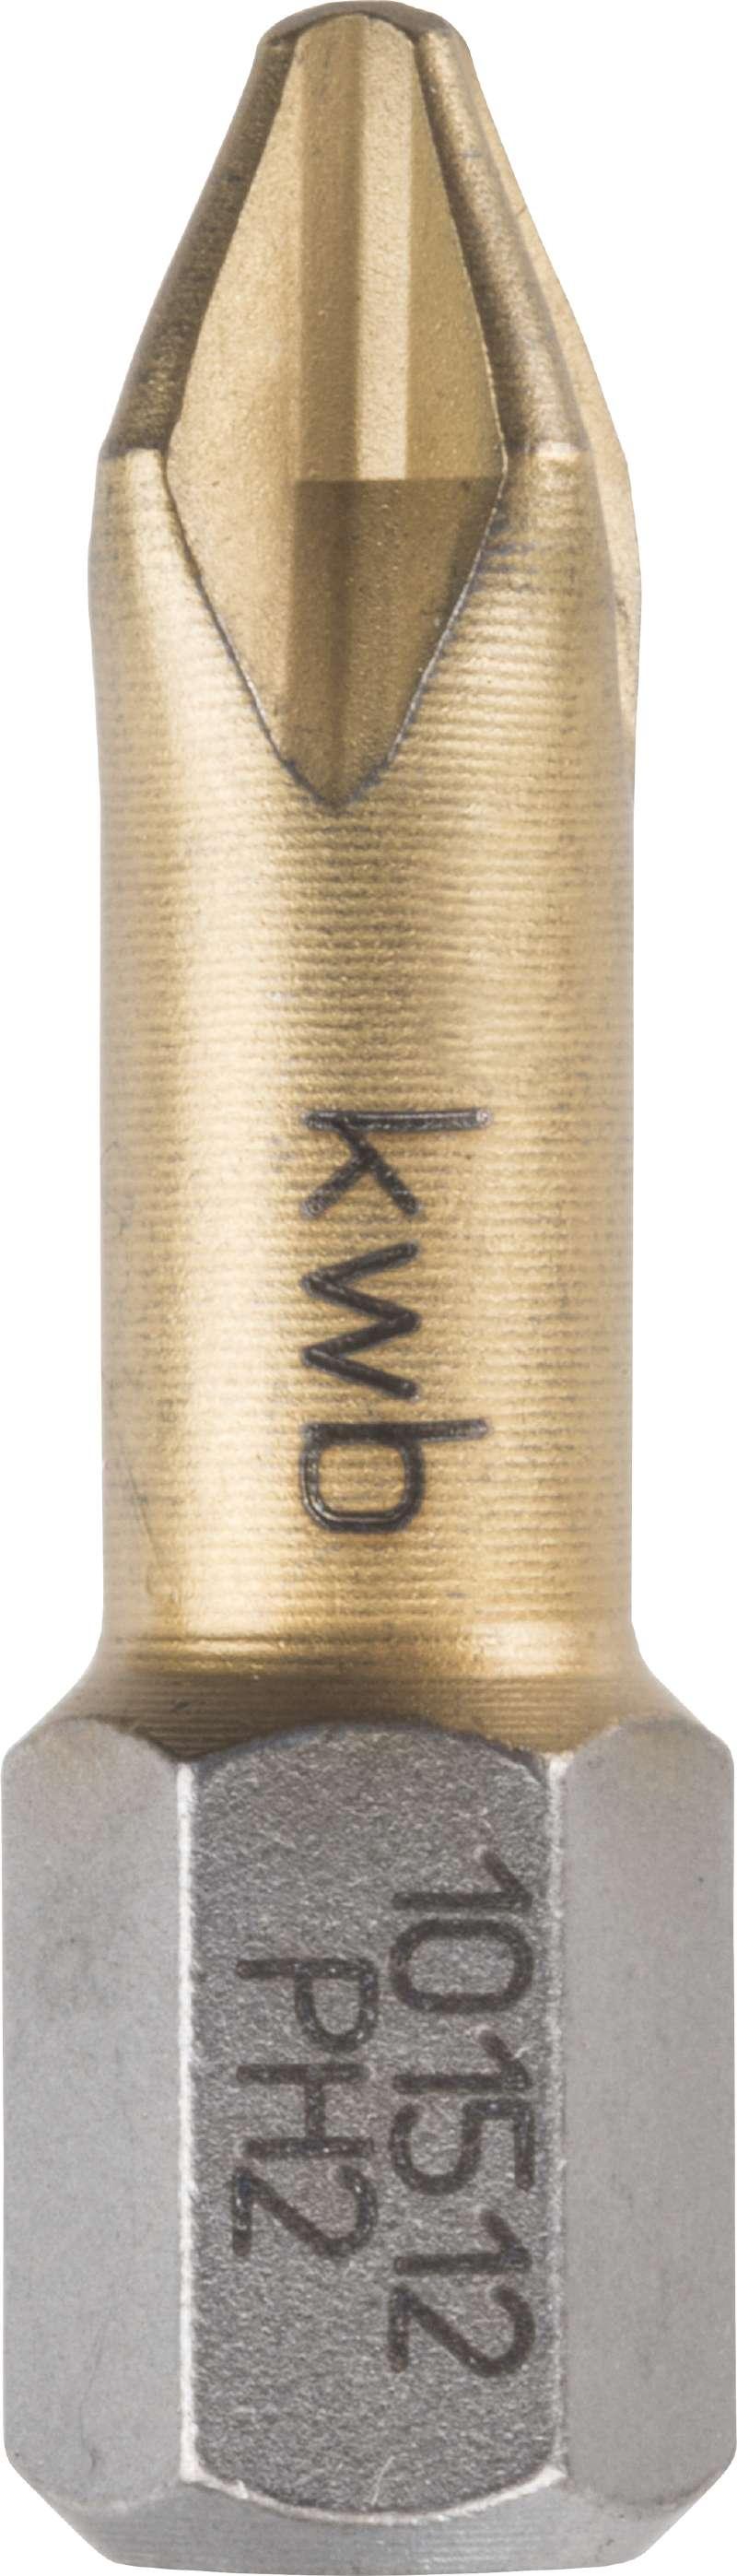 Бита Kwb 1015-01 бита kwb 1018 07